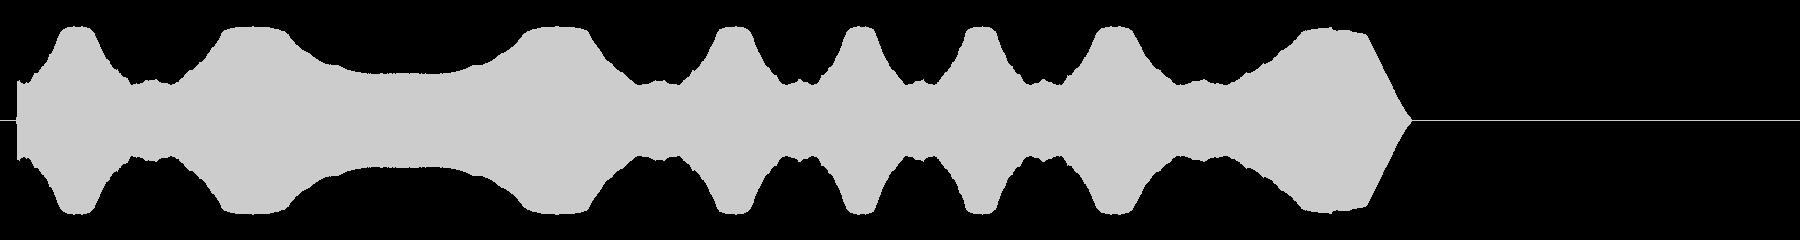 警報;警告音、振動音、安定の未再生の波形